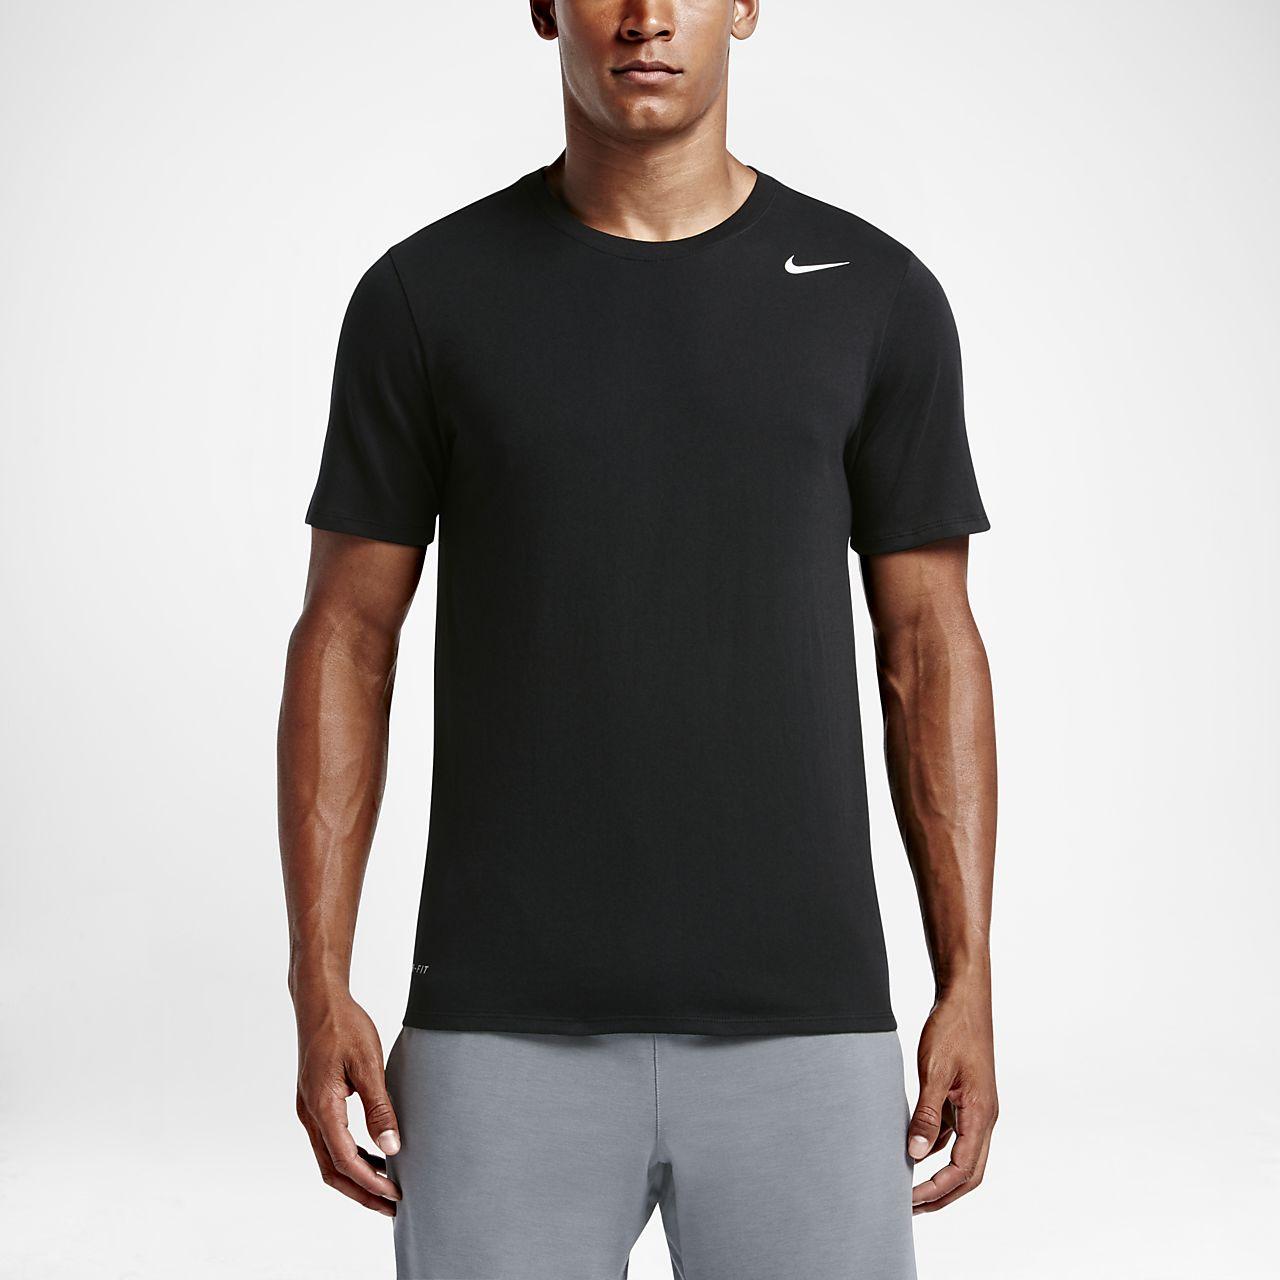 Cheap online Nike Performance Tshirt basique whiteblack